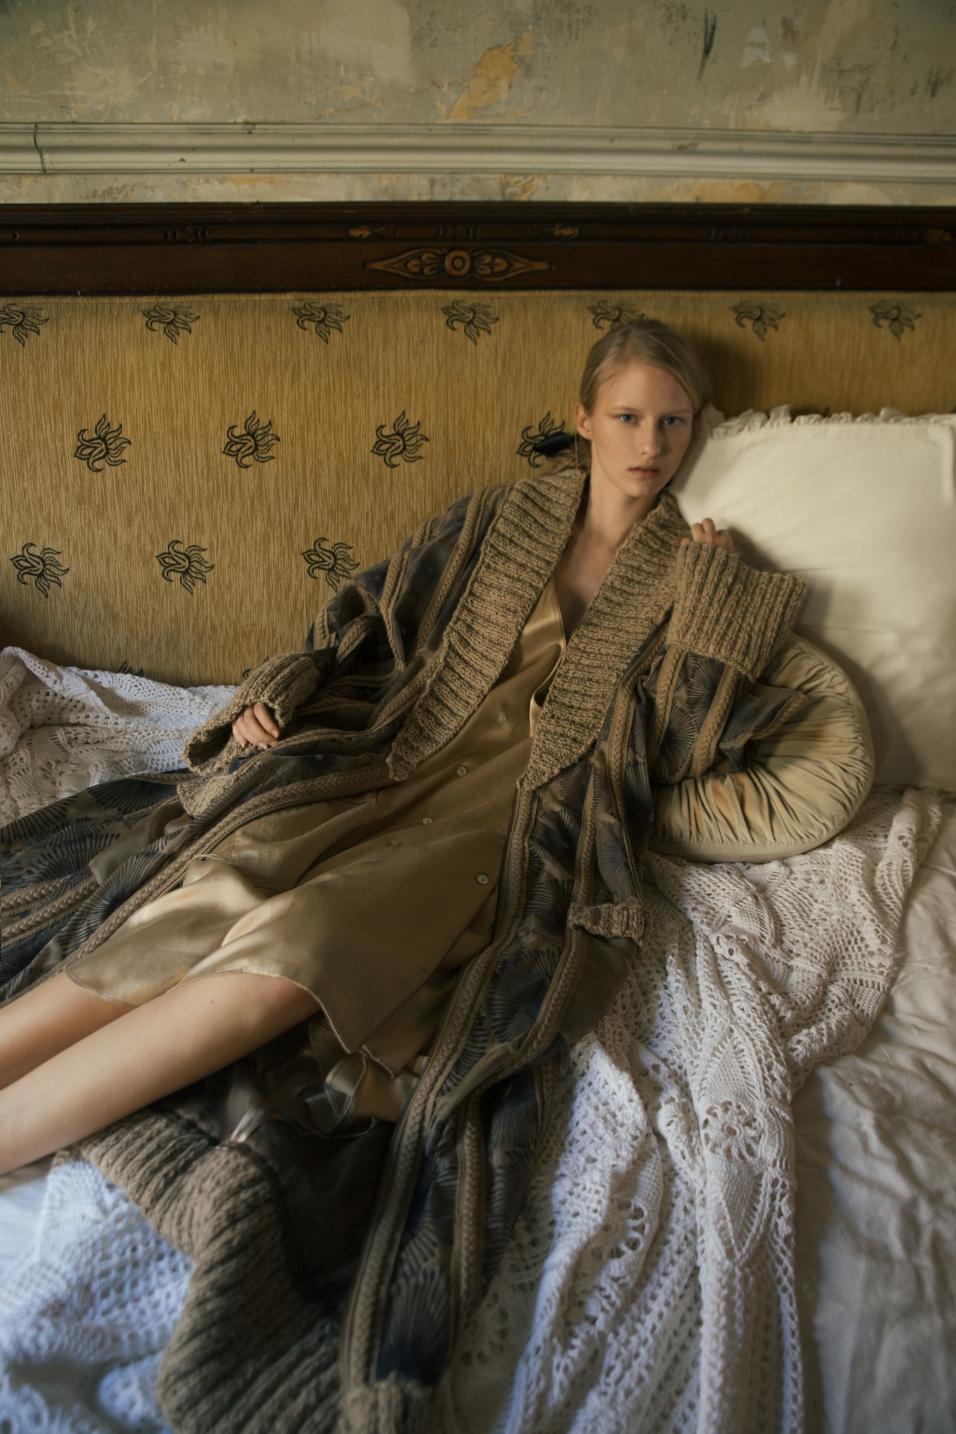 What's Left Behind   Maital Levitan, designer   Photography: Rotem Lebel